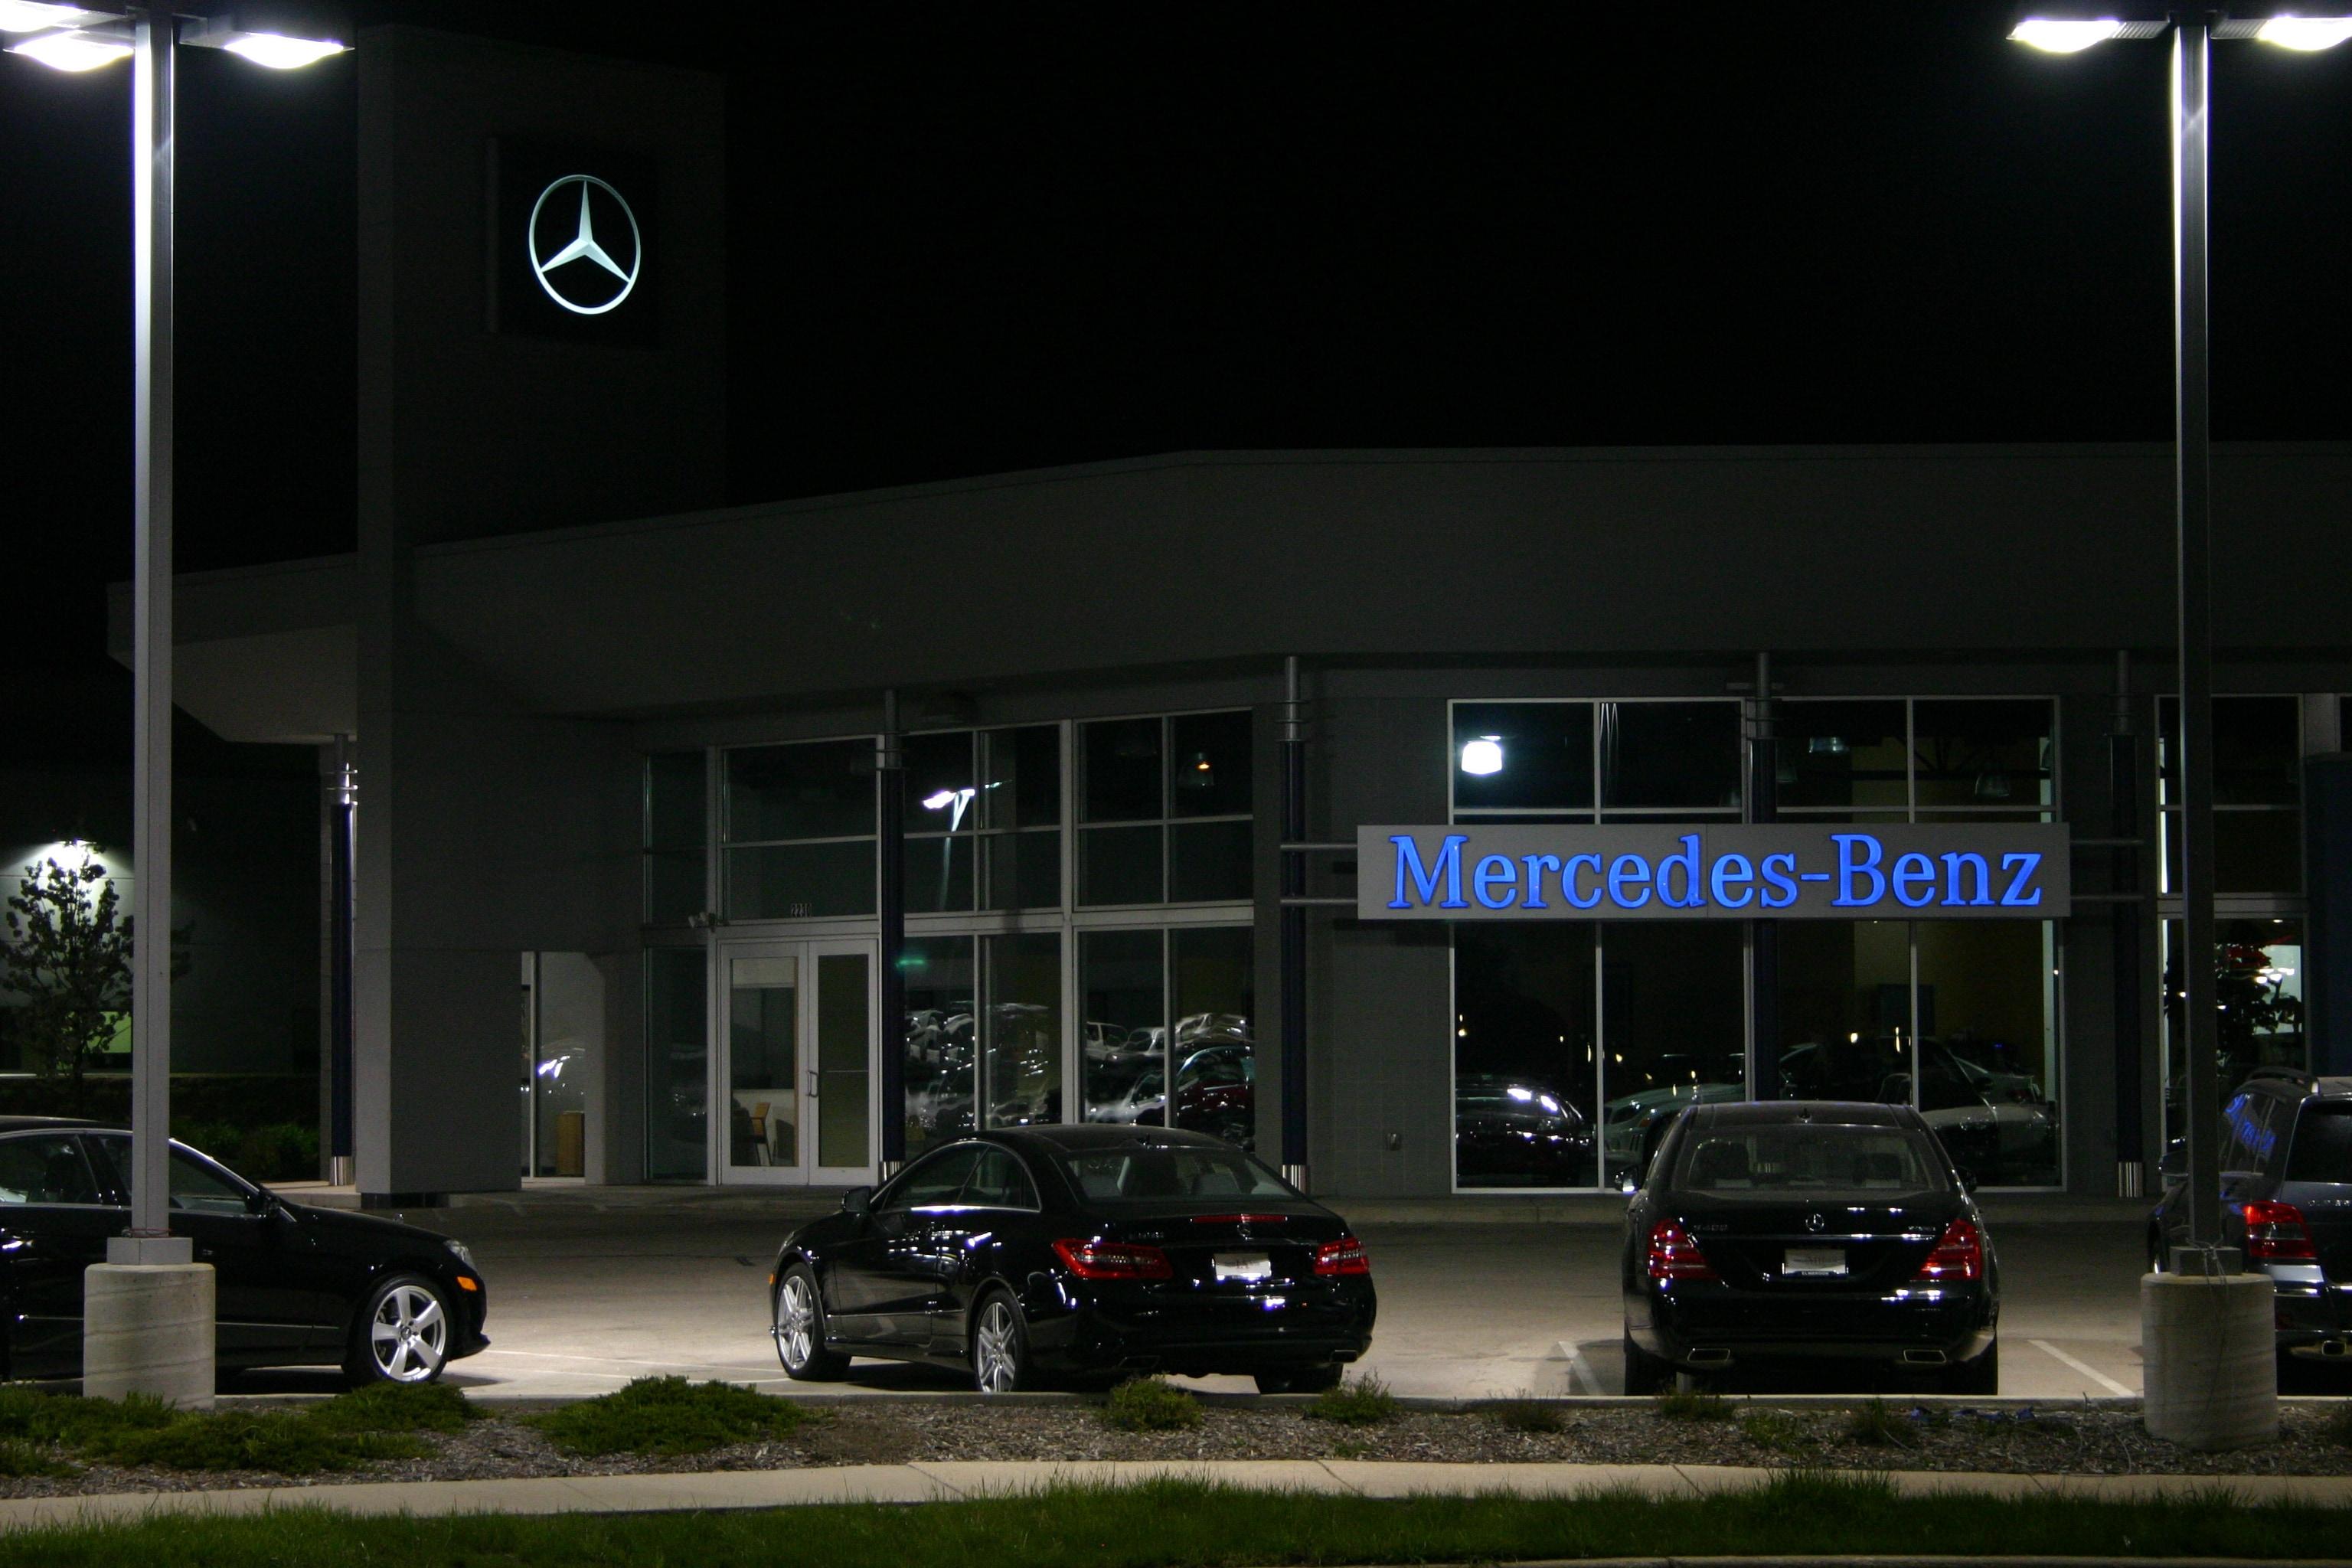 2018 mercedes benz gls 550 suv waukesha for Mercedes benz elmbrook